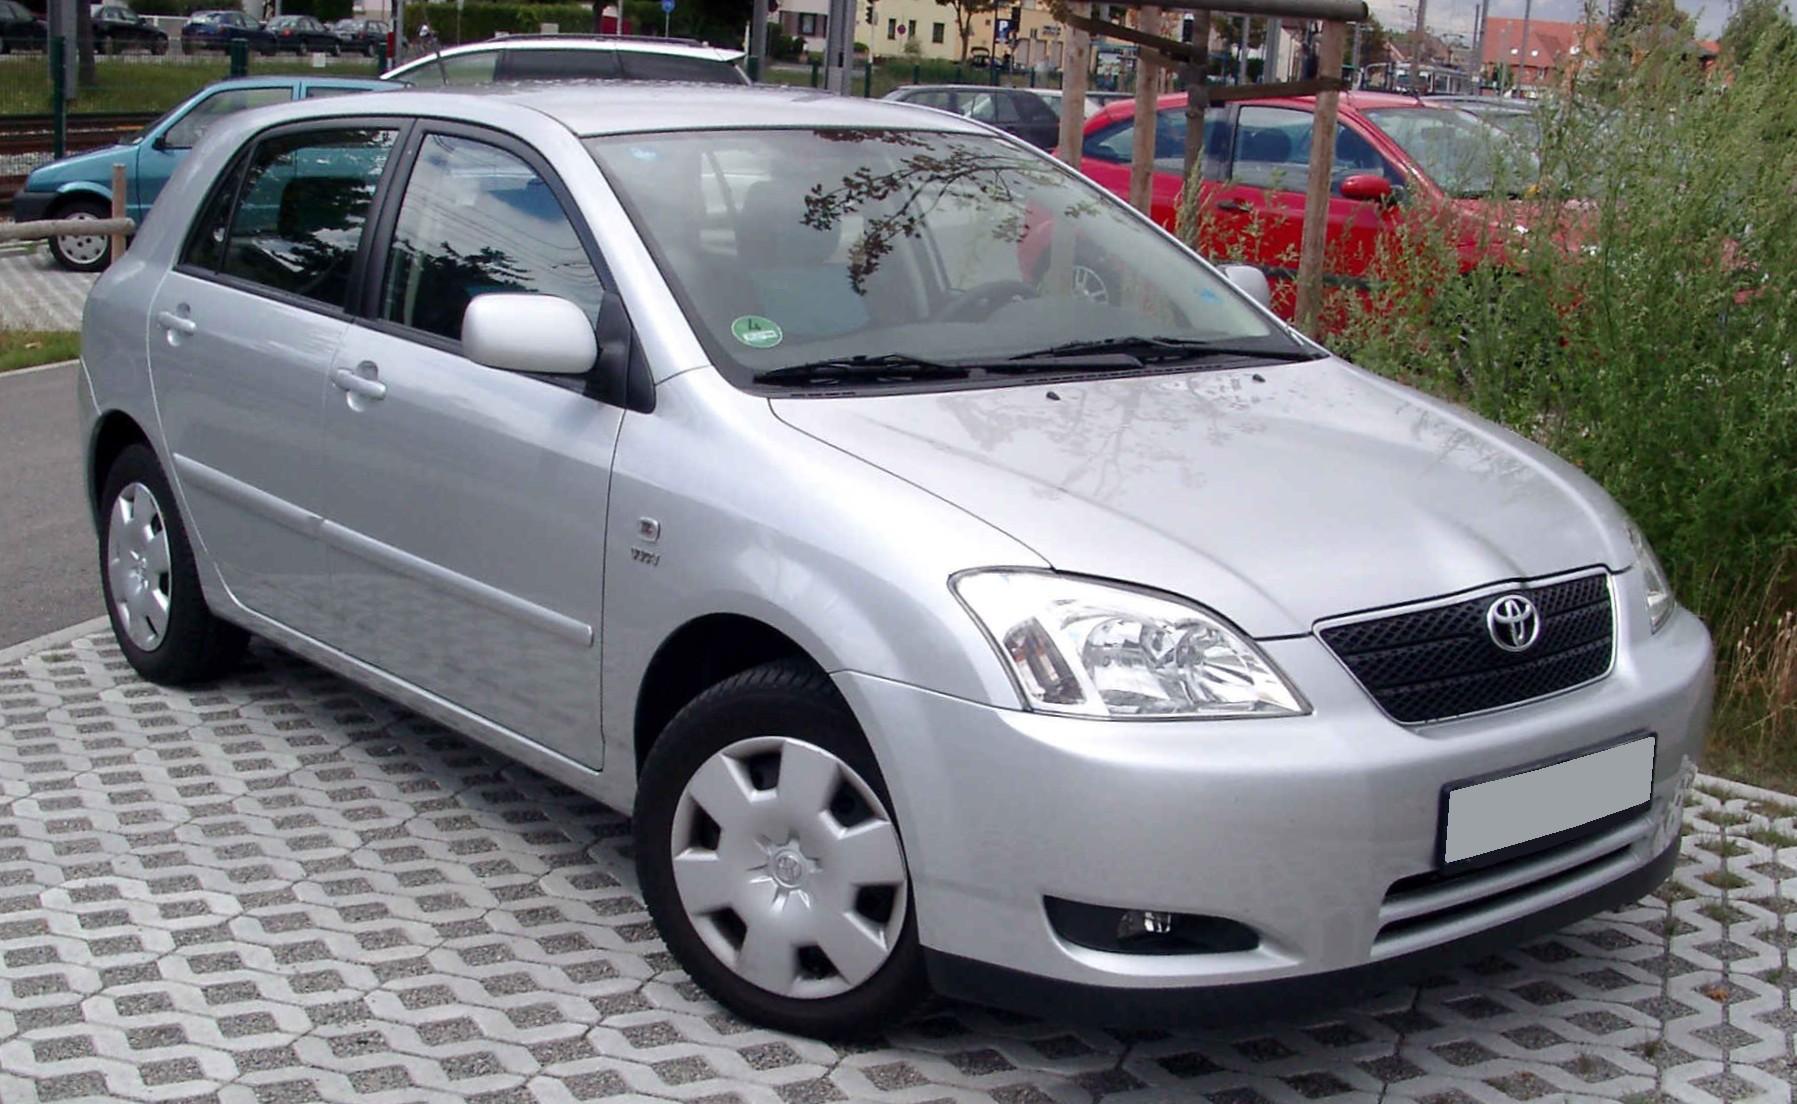 File:Toyota Corolla front 20080808.jpg - Wikimedia Commons